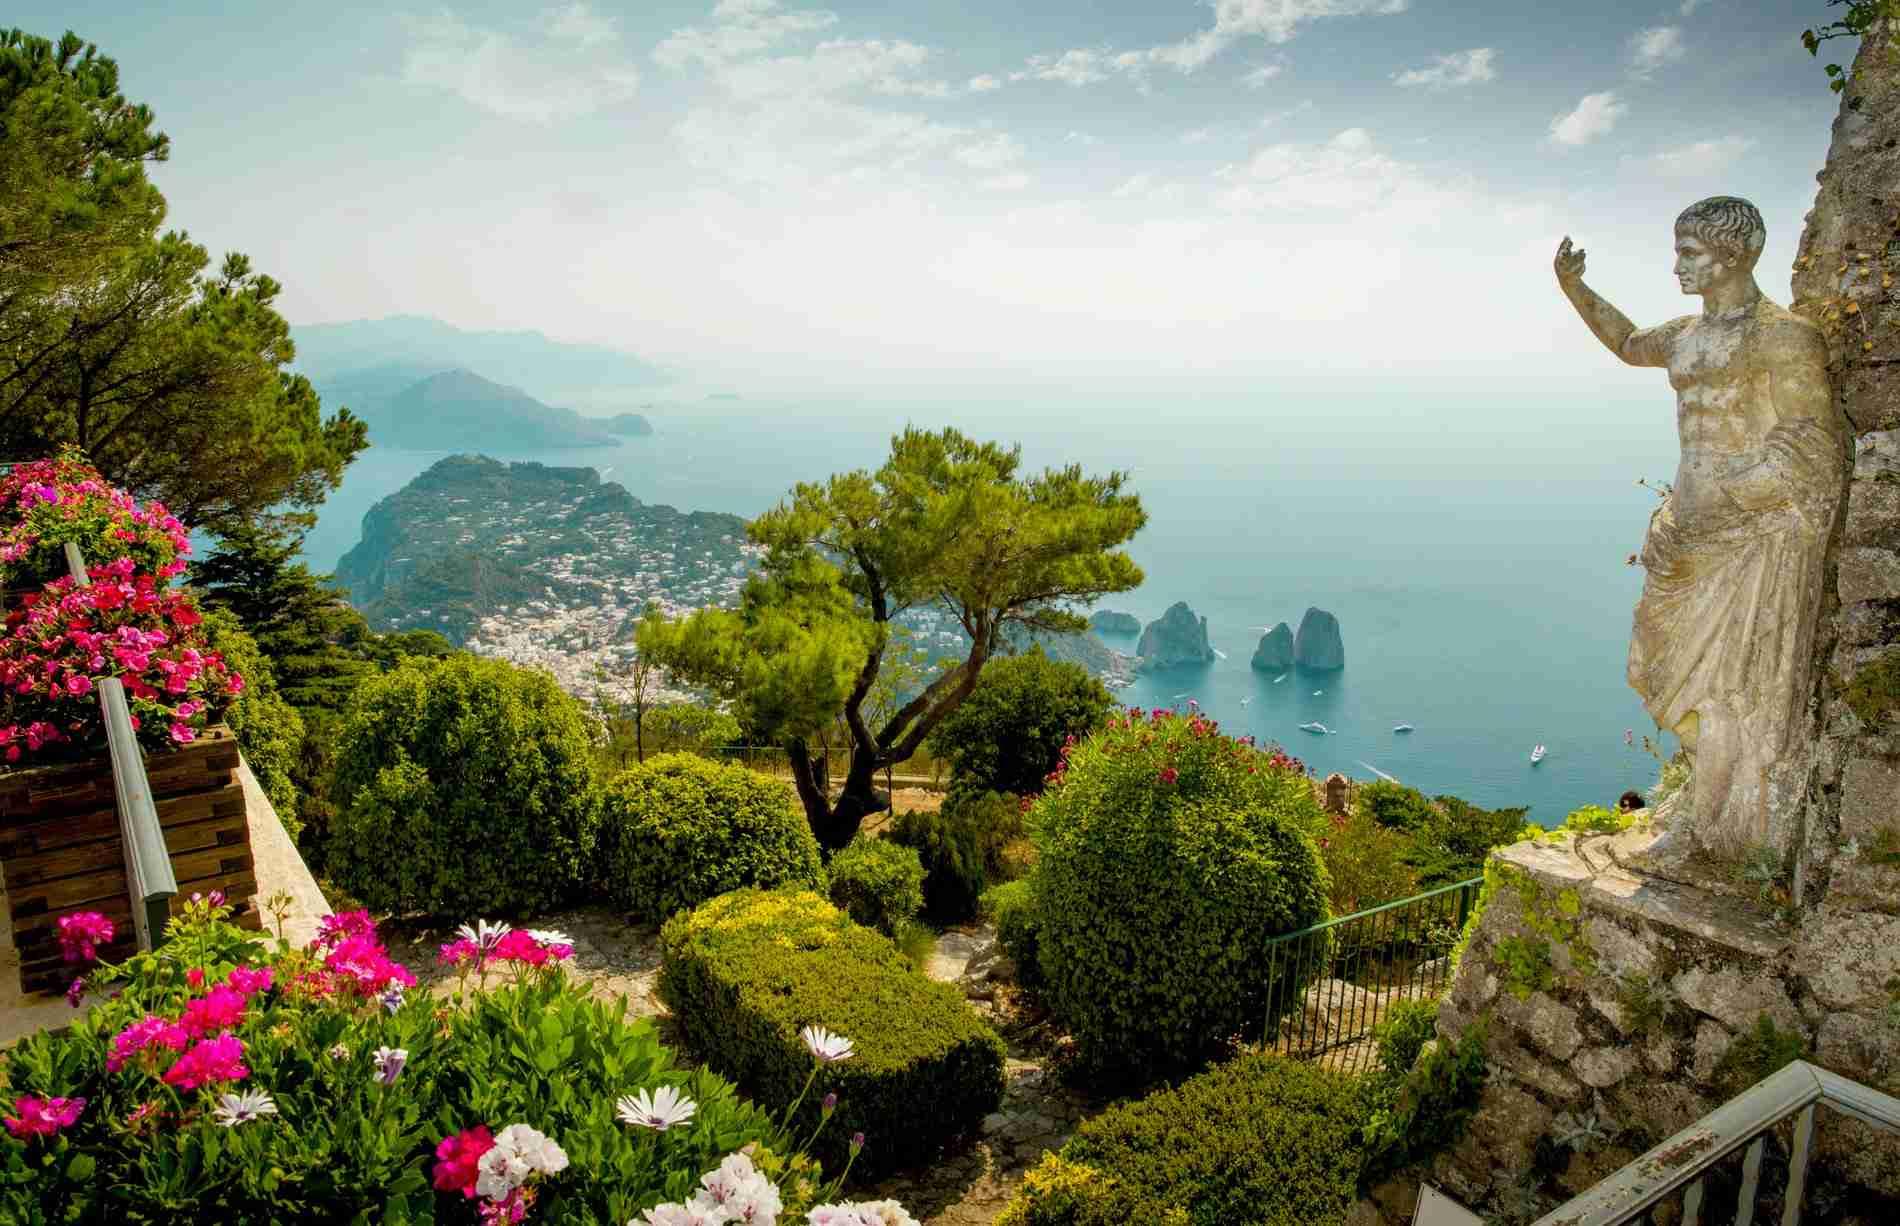 amalfi coast walking, Our New Walking Holidays in Italy: the Hidden Trails of the Amalfi Coast, Our New Walking Holidays in Italy, the Hidden Trails of the Amalfi Coast